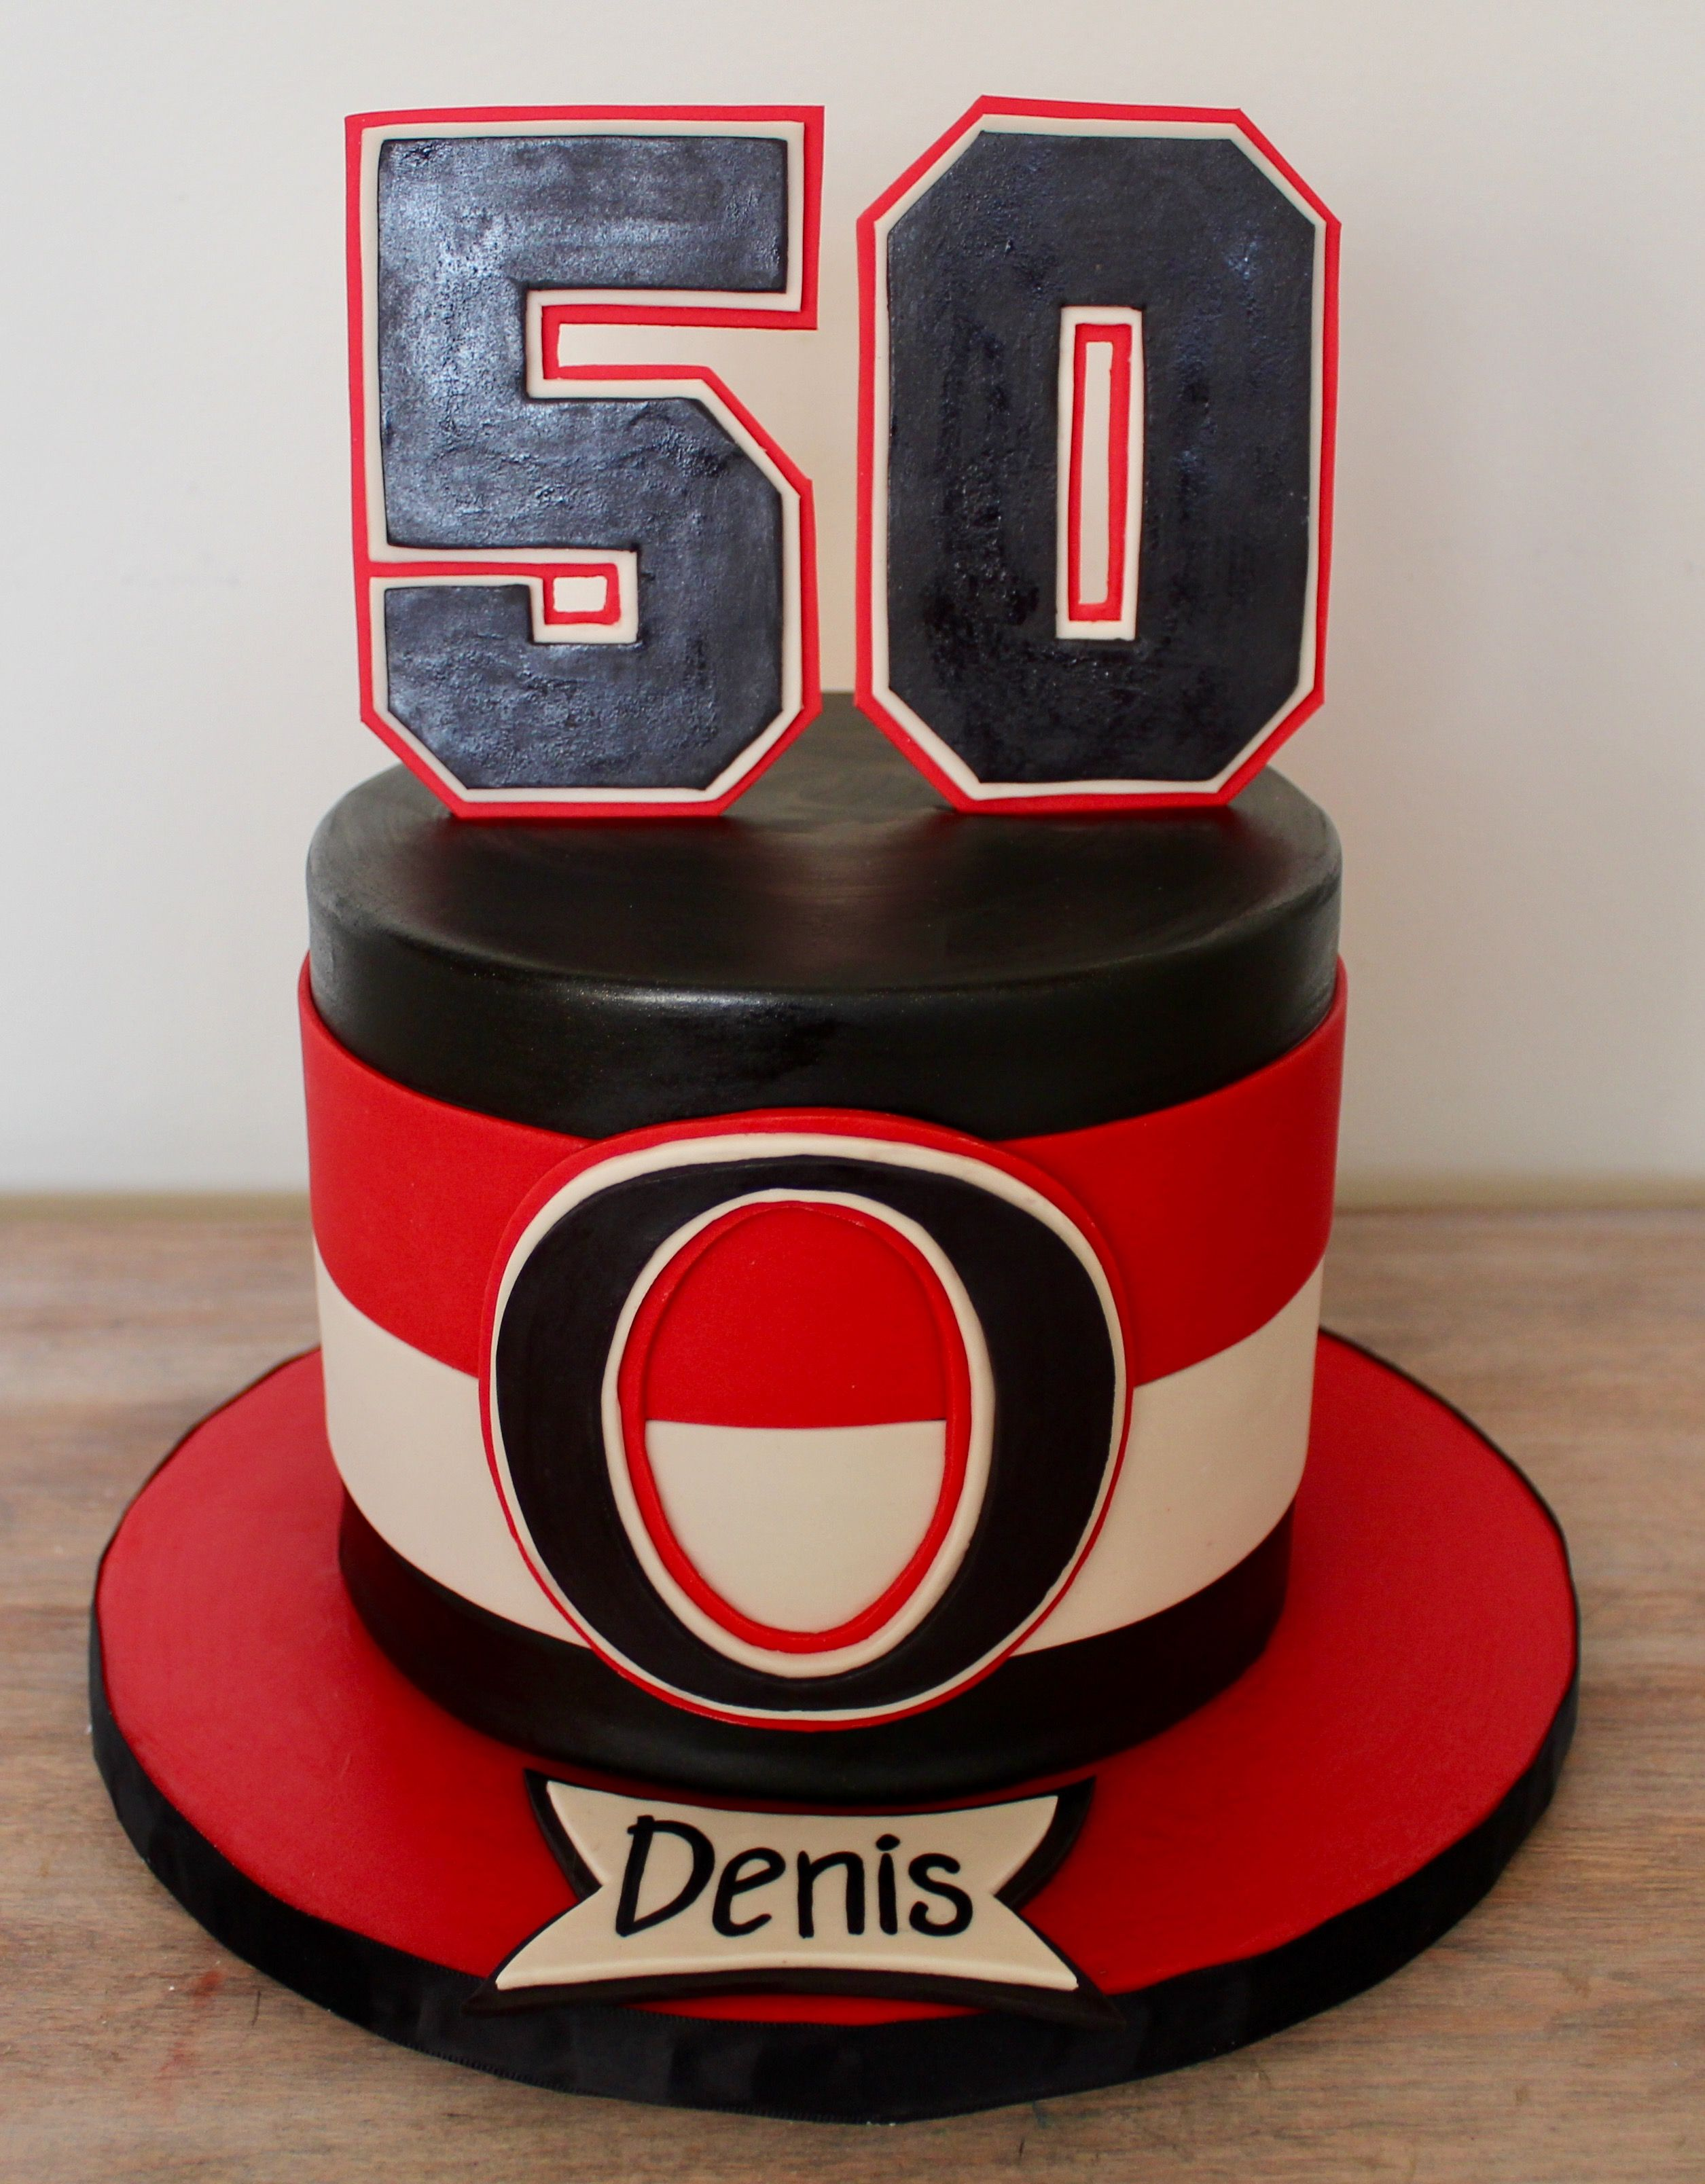 39fe61ef9a9 Ottawa Senators Sens cake NHL hockey 50th birthday cake | Kota's 6th ...